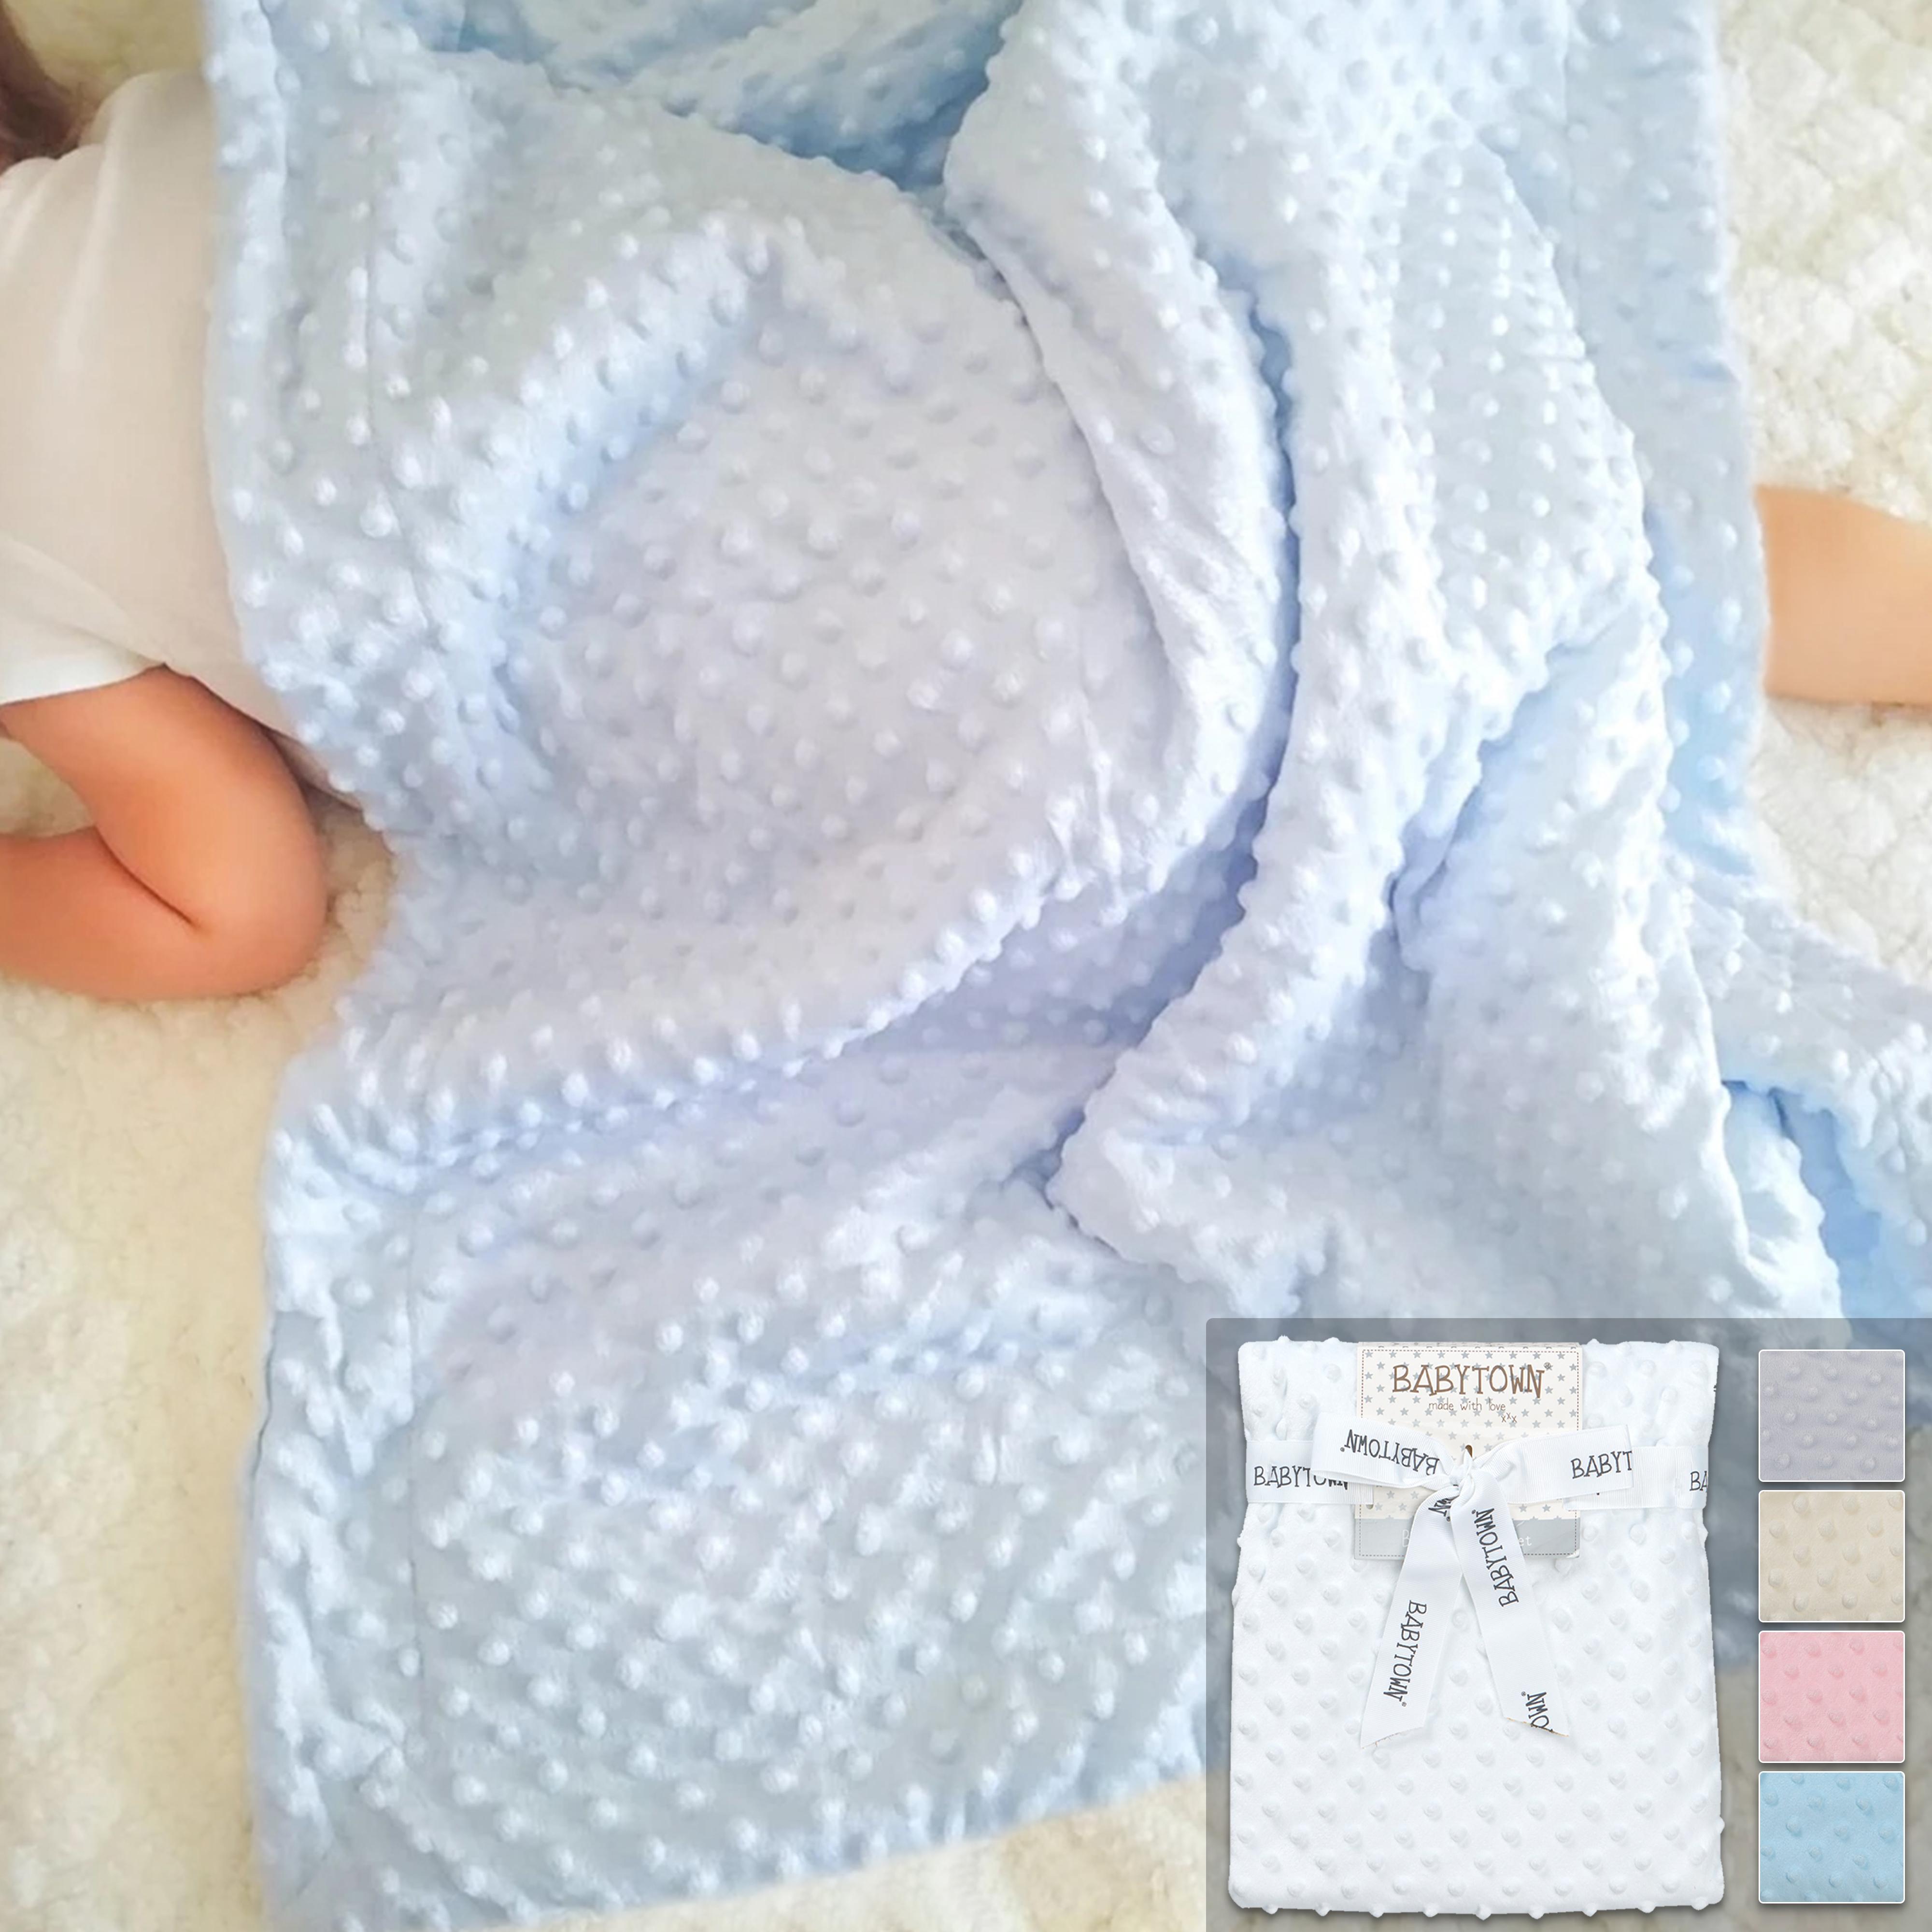 BABY SOFT FLEECE BLANKET NEWBORN CRIB PRAM INFANT 70x70cm BOY GIRL 3 COLOURS